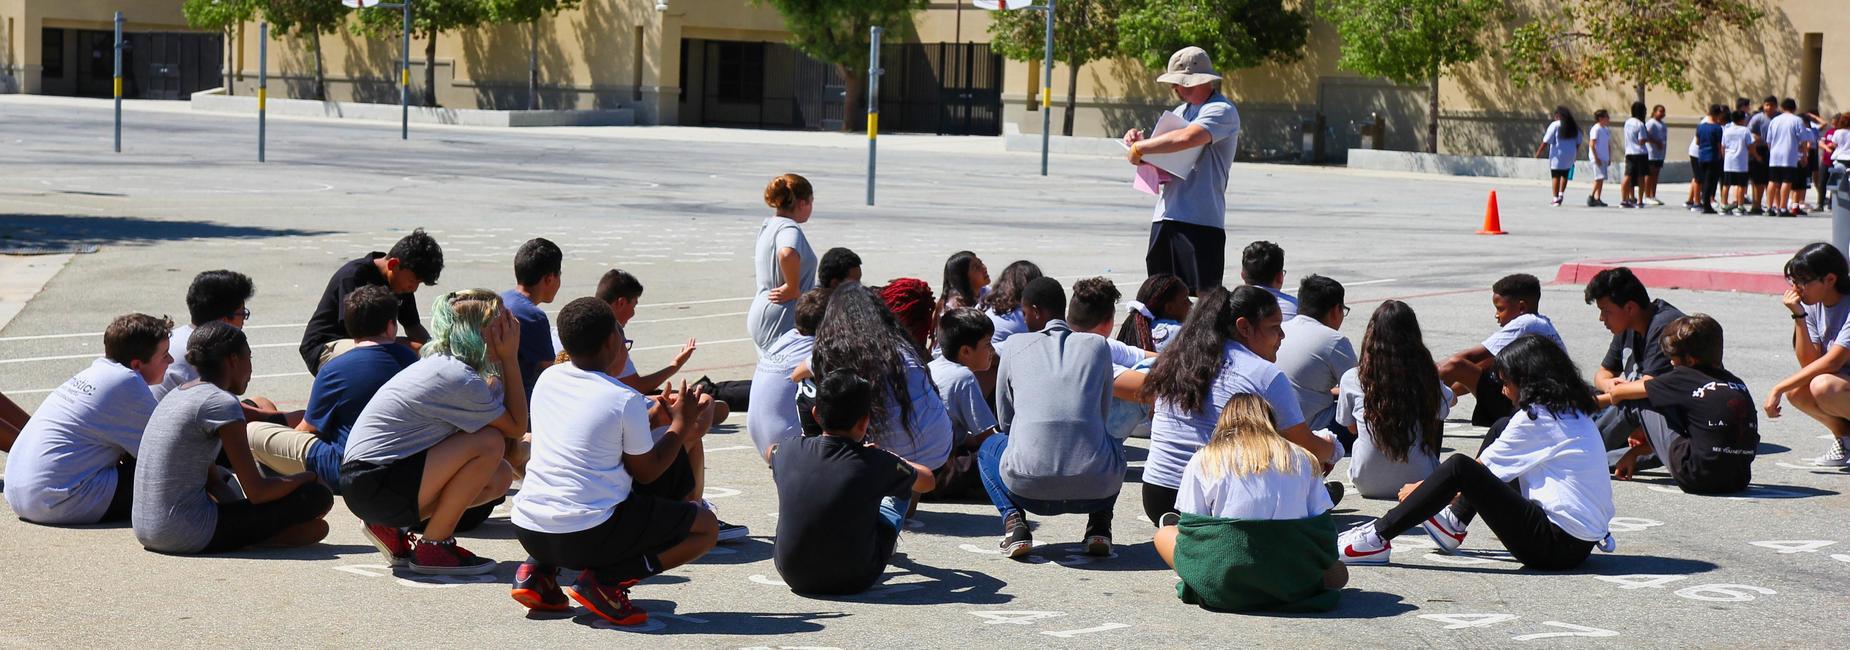 Students attending P.E. class